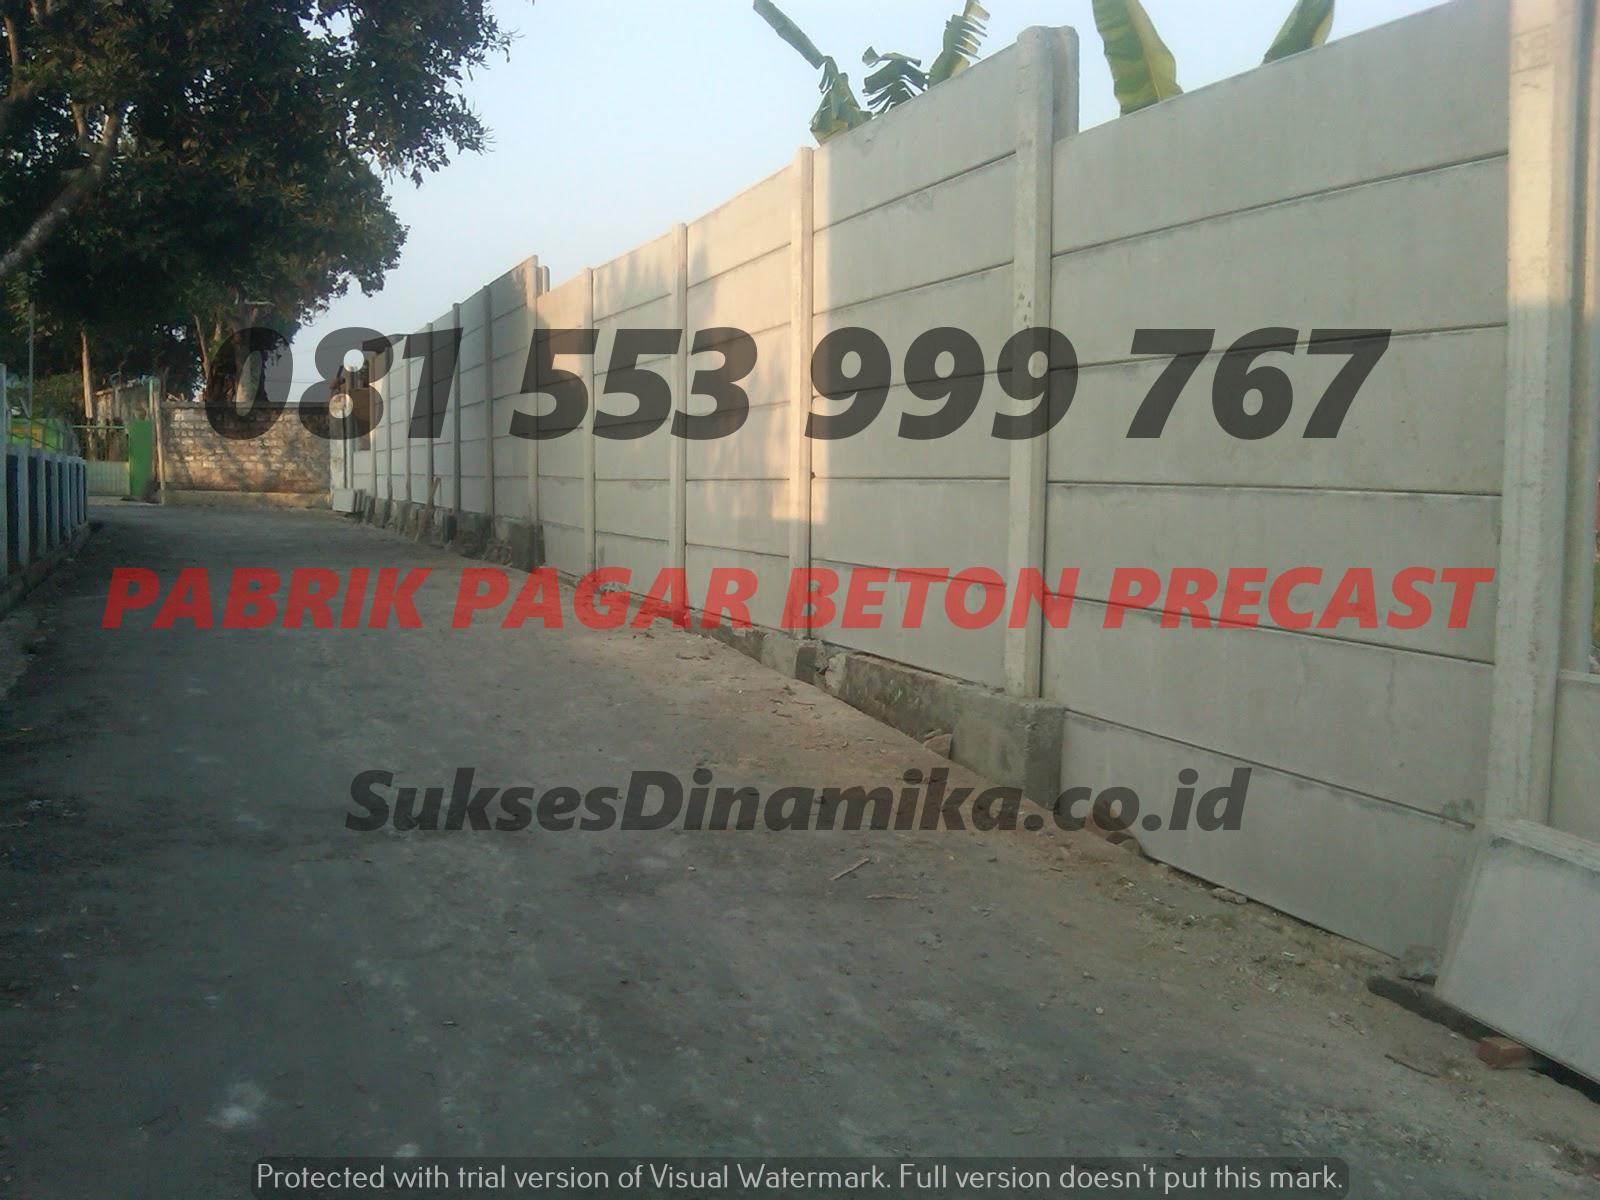 Harga Pagar Beton Precast Terpasang Gresik, Kelemahan Pagar Panel Beton